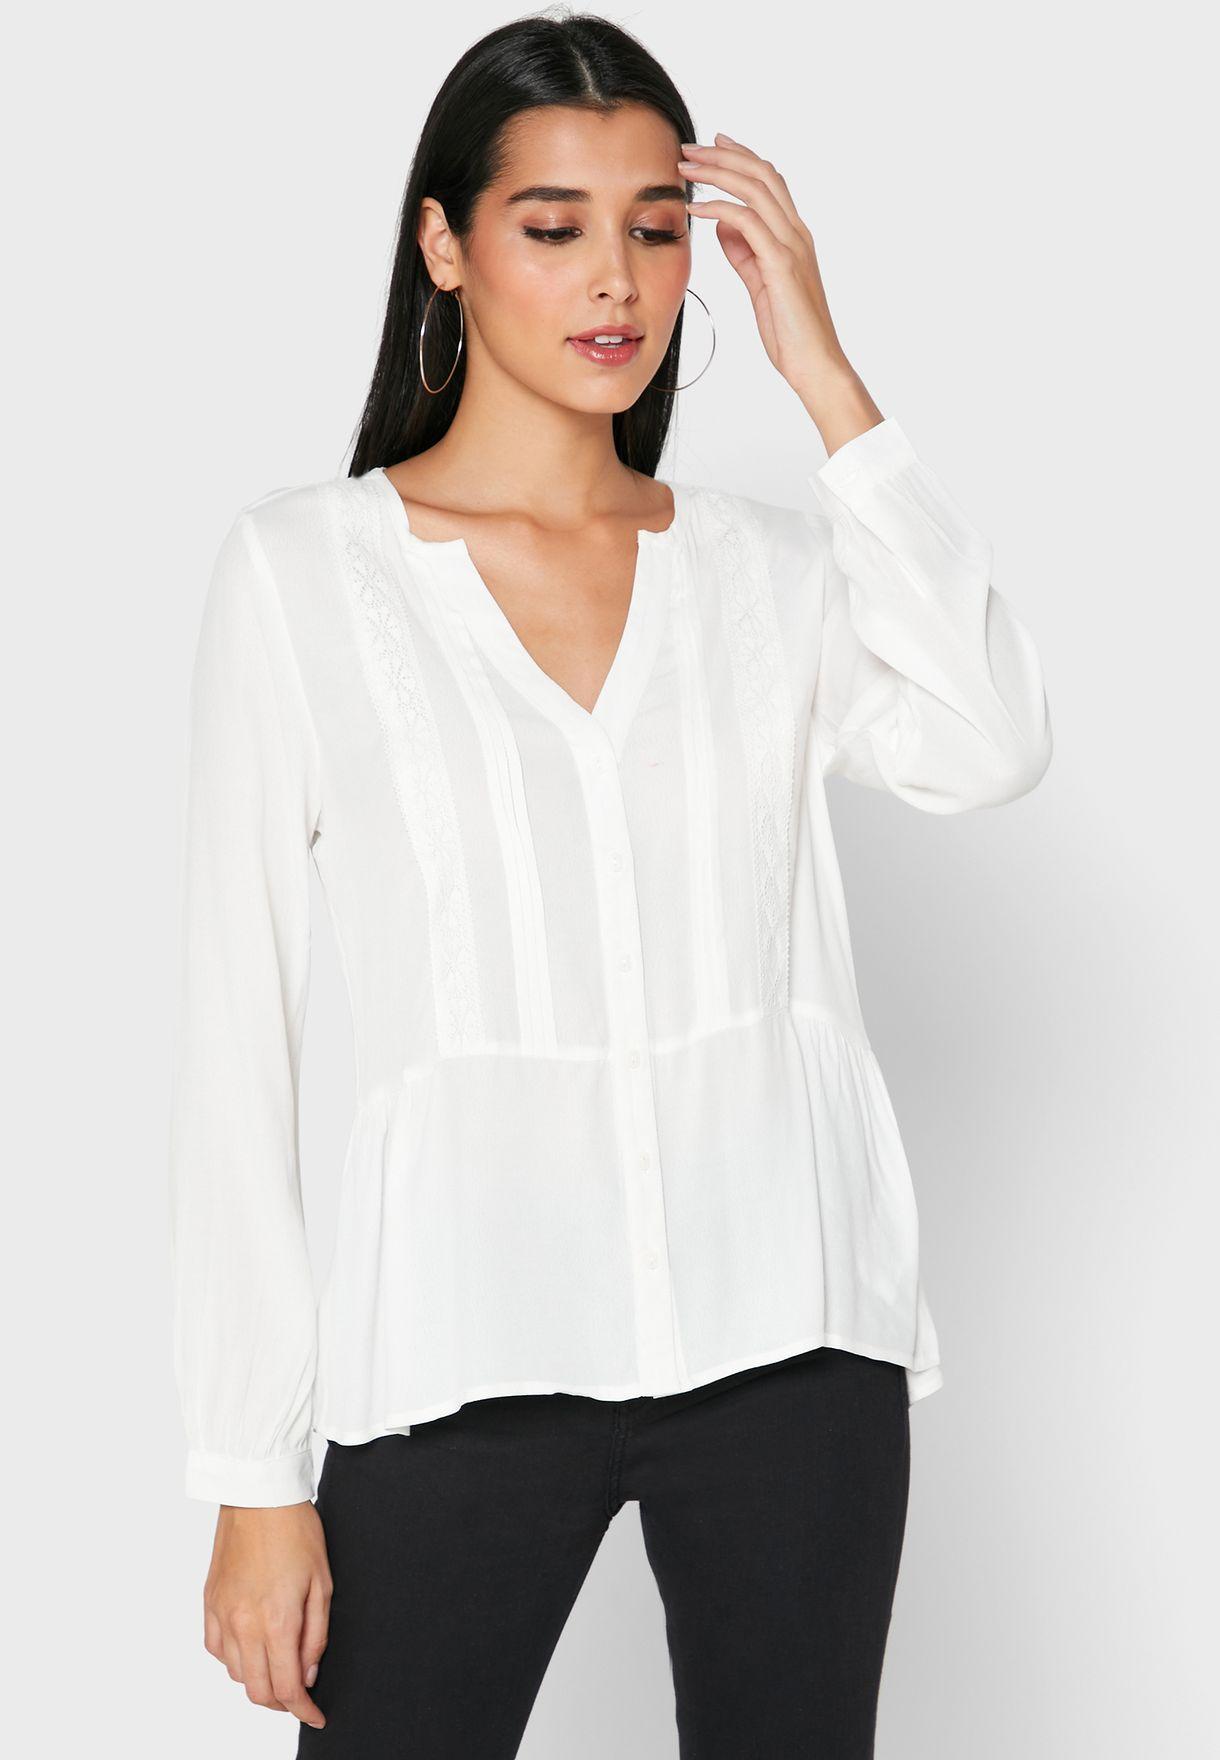 V-Neck Peplum Shirt